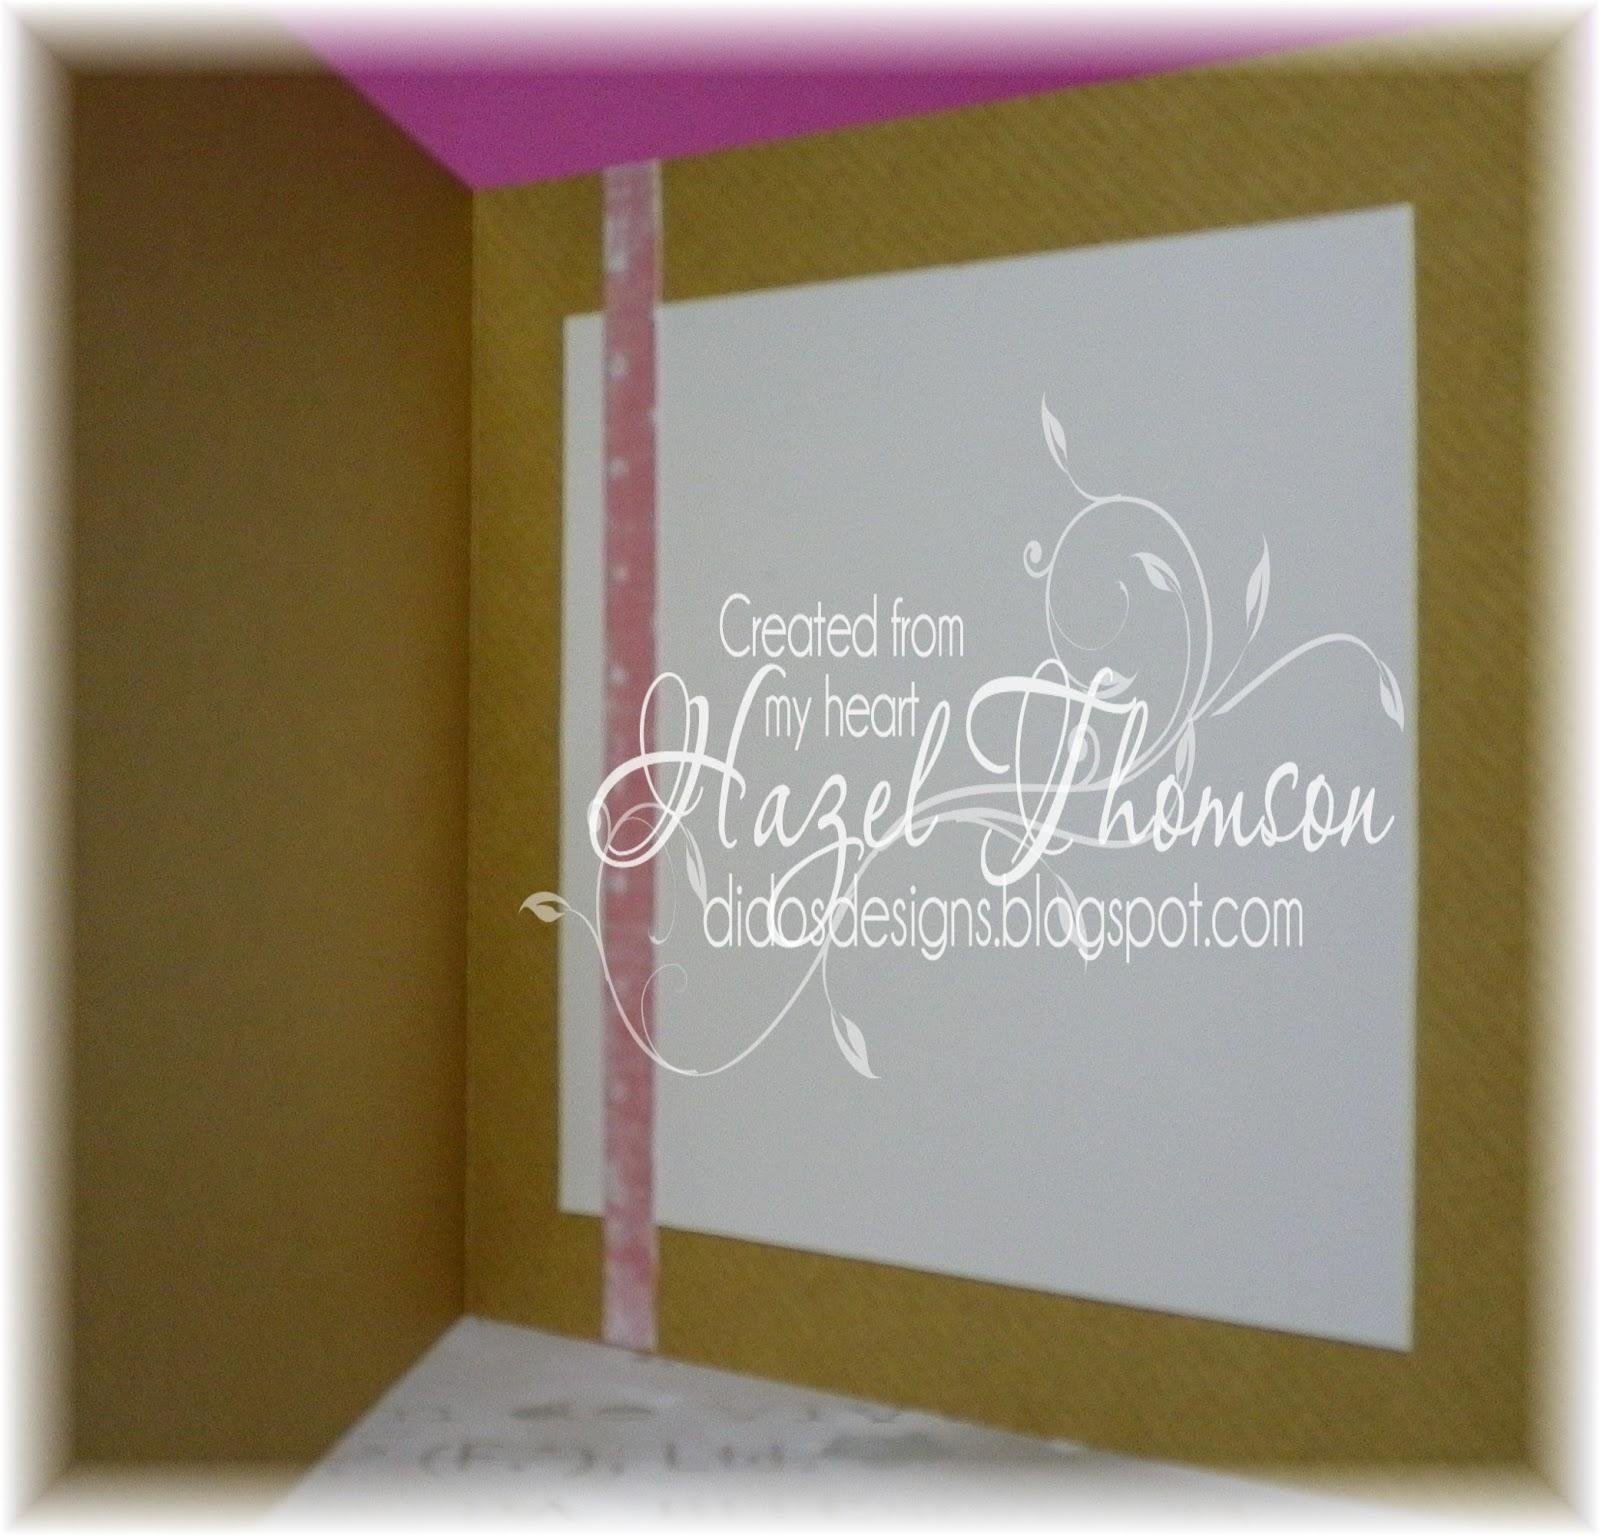 http://3.bp.blogspot.com/-eIXfvoooypc/UI_hSSmPpsI/AAAAAAAAJe8/bpOPX17tsKI/s1600/Cards+By+Dido\'s+Designs+004.JPG